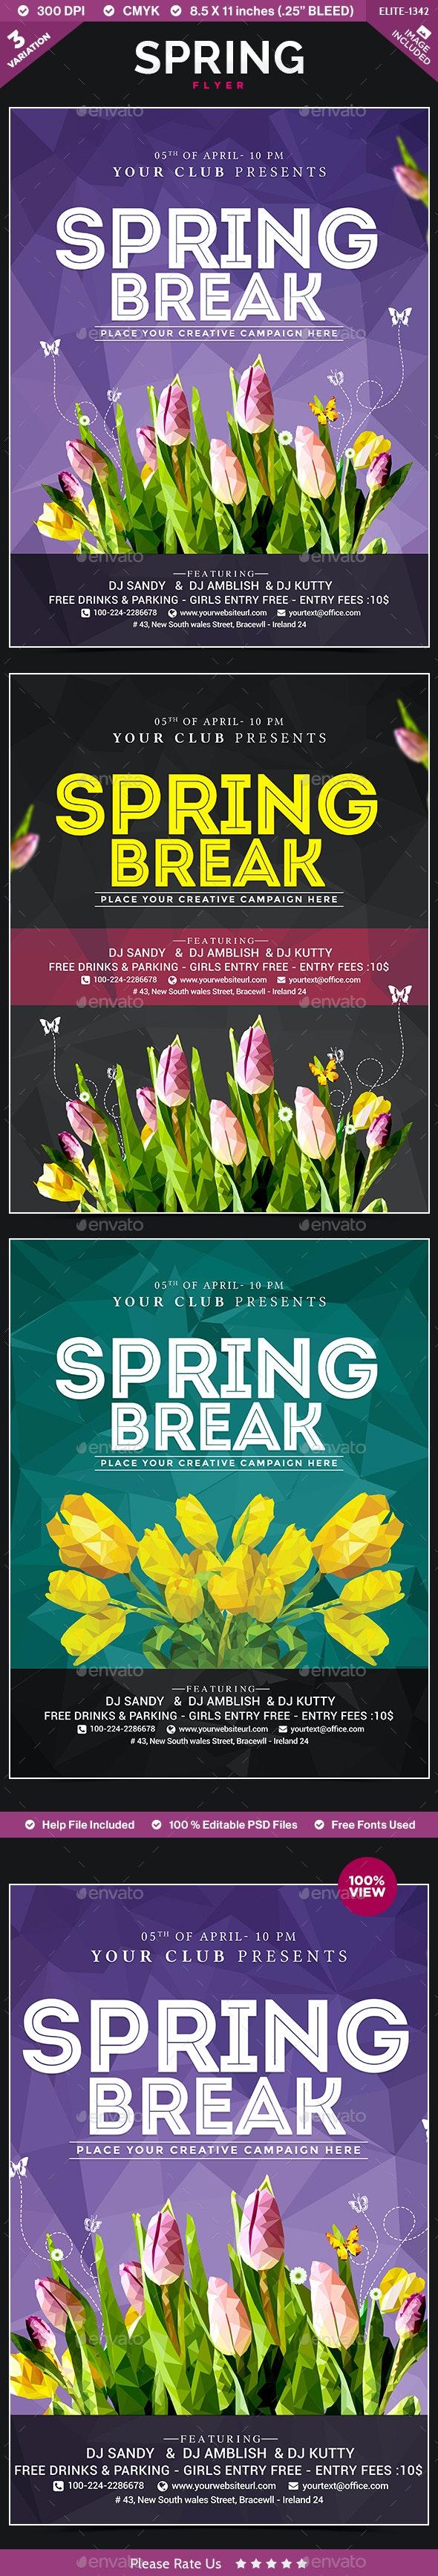 Spring Flyer - 3 Templates - Flyers Print Templates